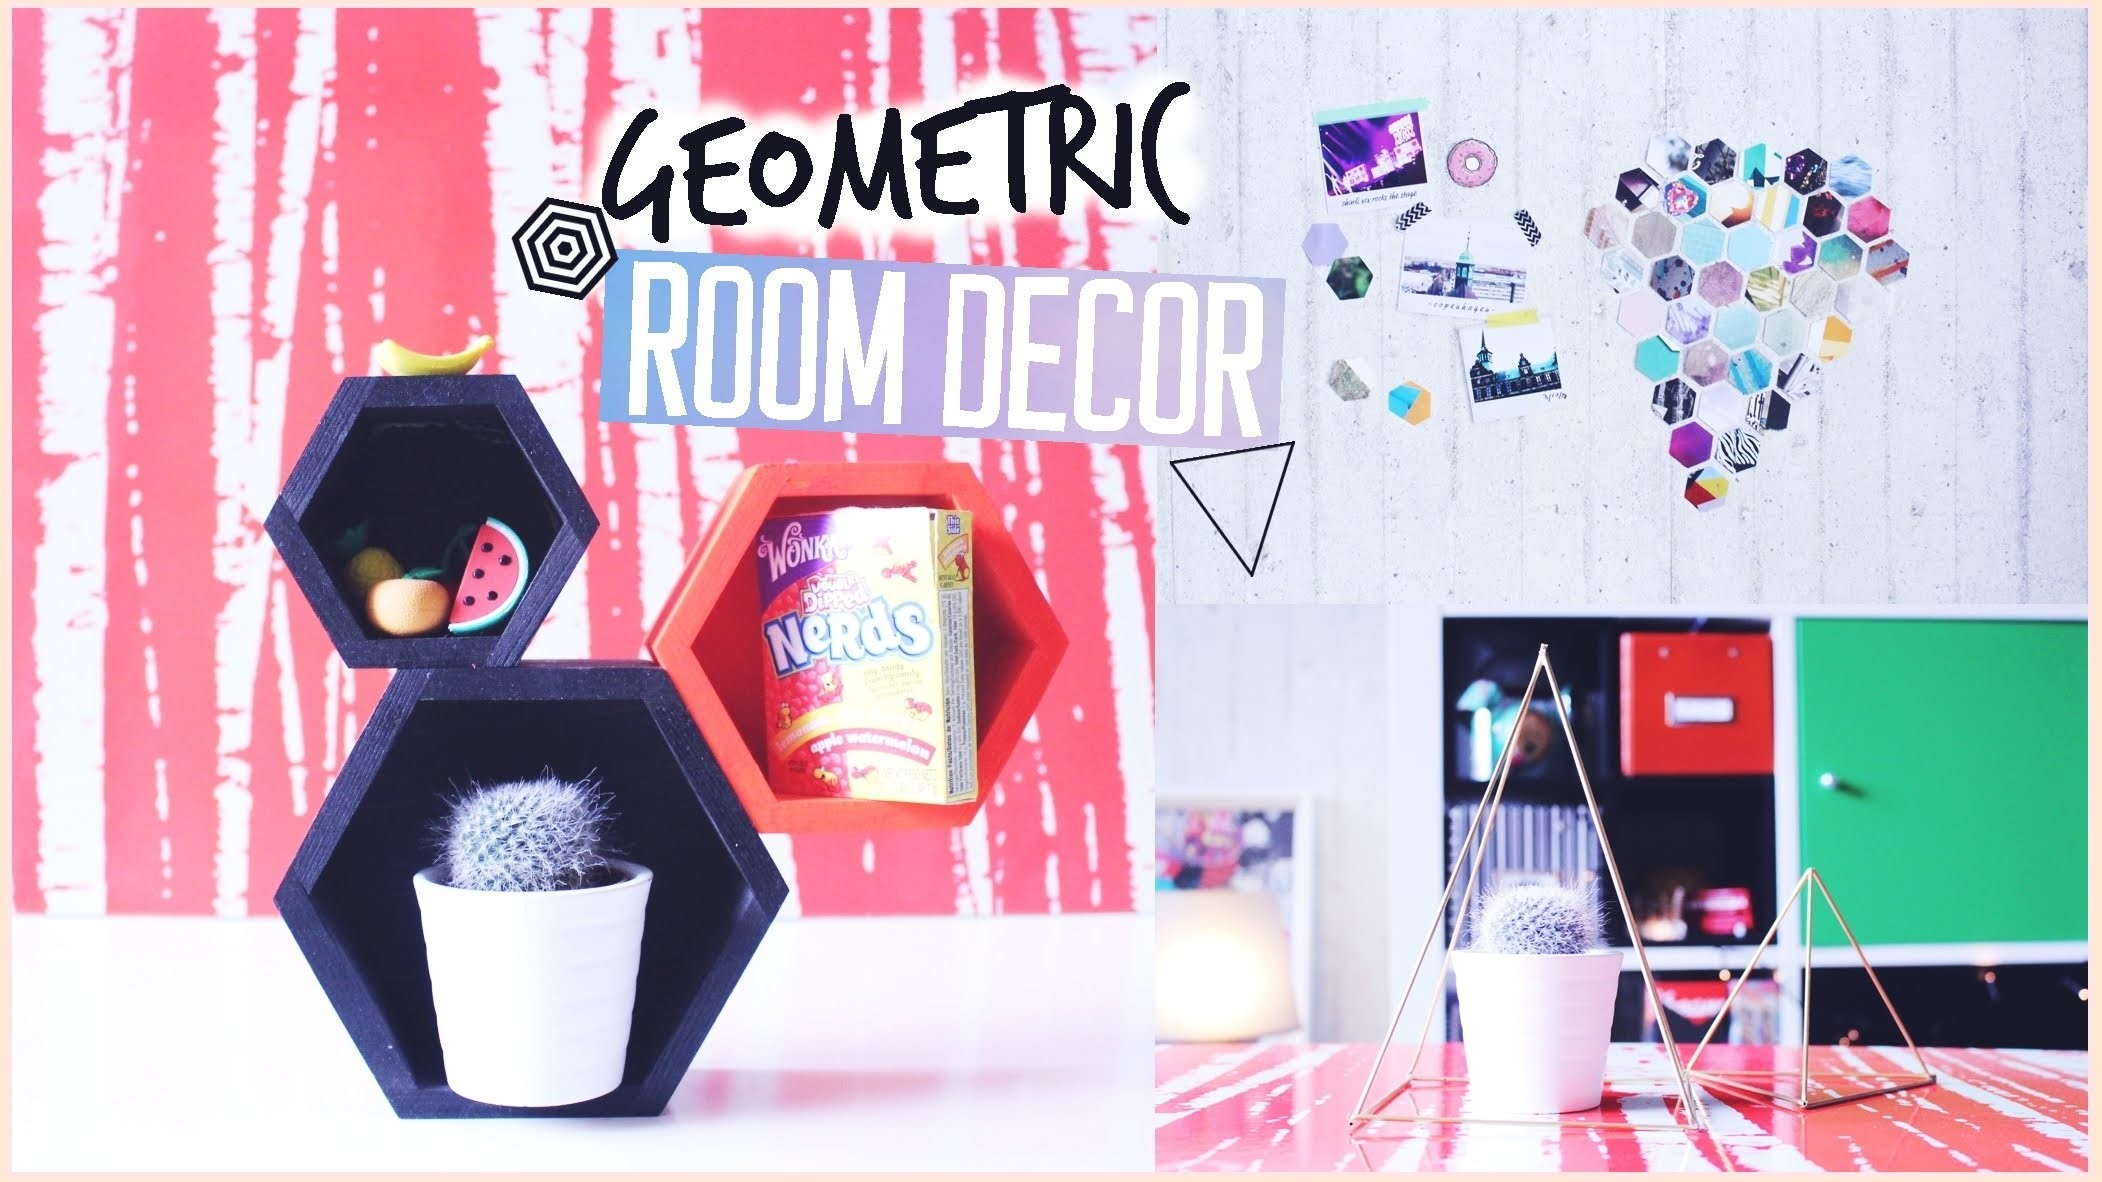 GEOMETRIC Room Decor Ideen! ♢ Einfach & günstig!